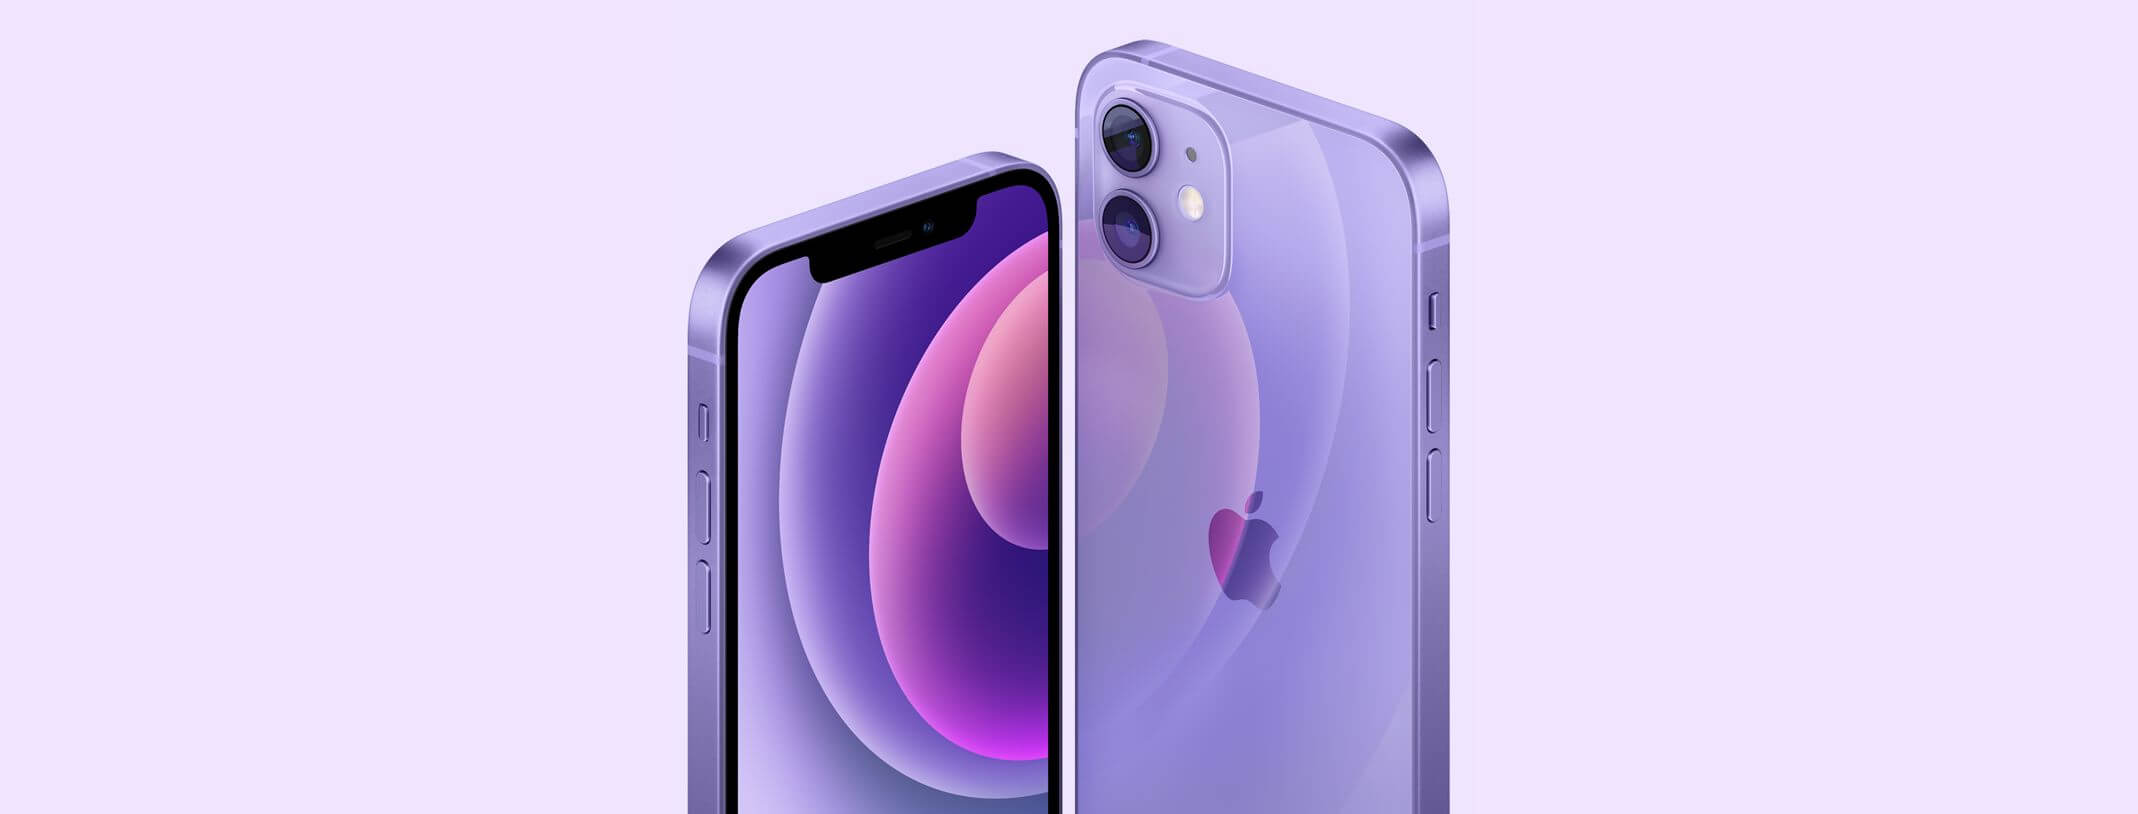 iphone-12-gallery1-2021